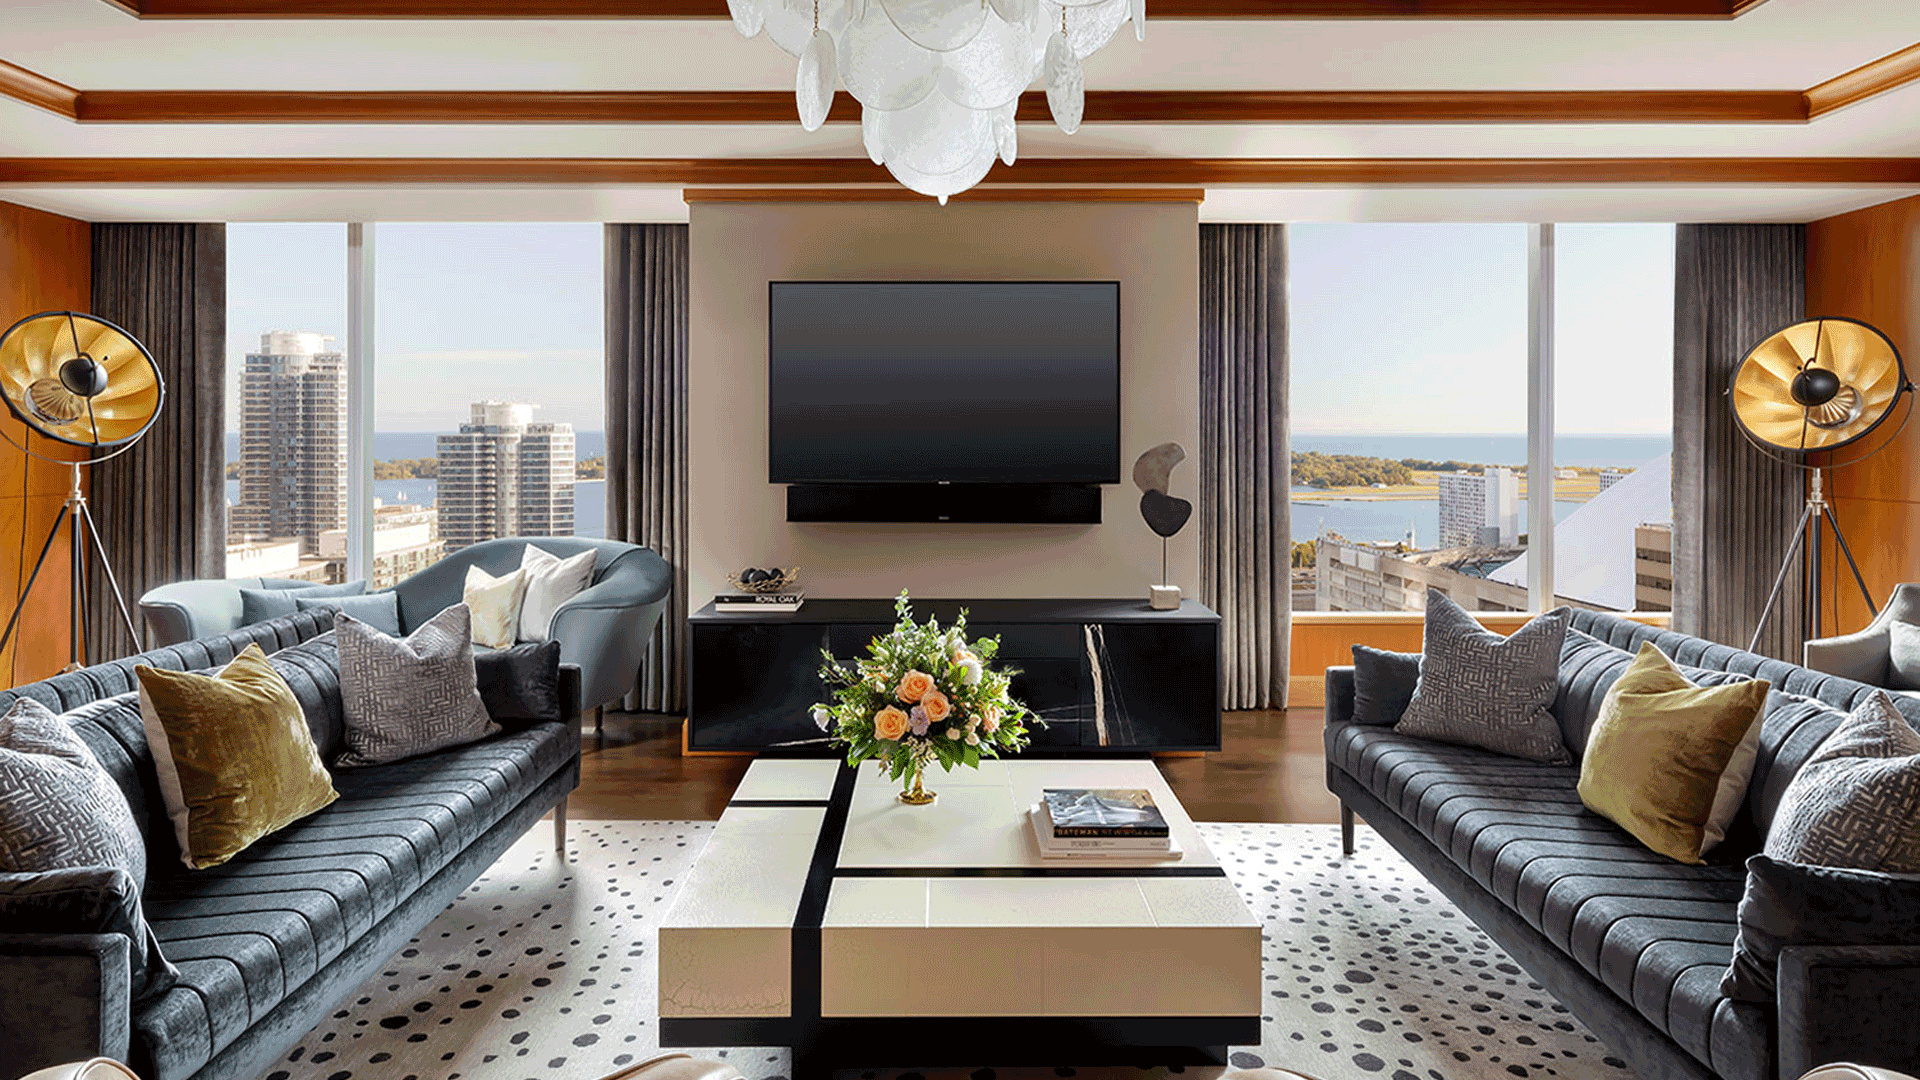 The Ritz-Carlton Hotel, Toronot: a suite